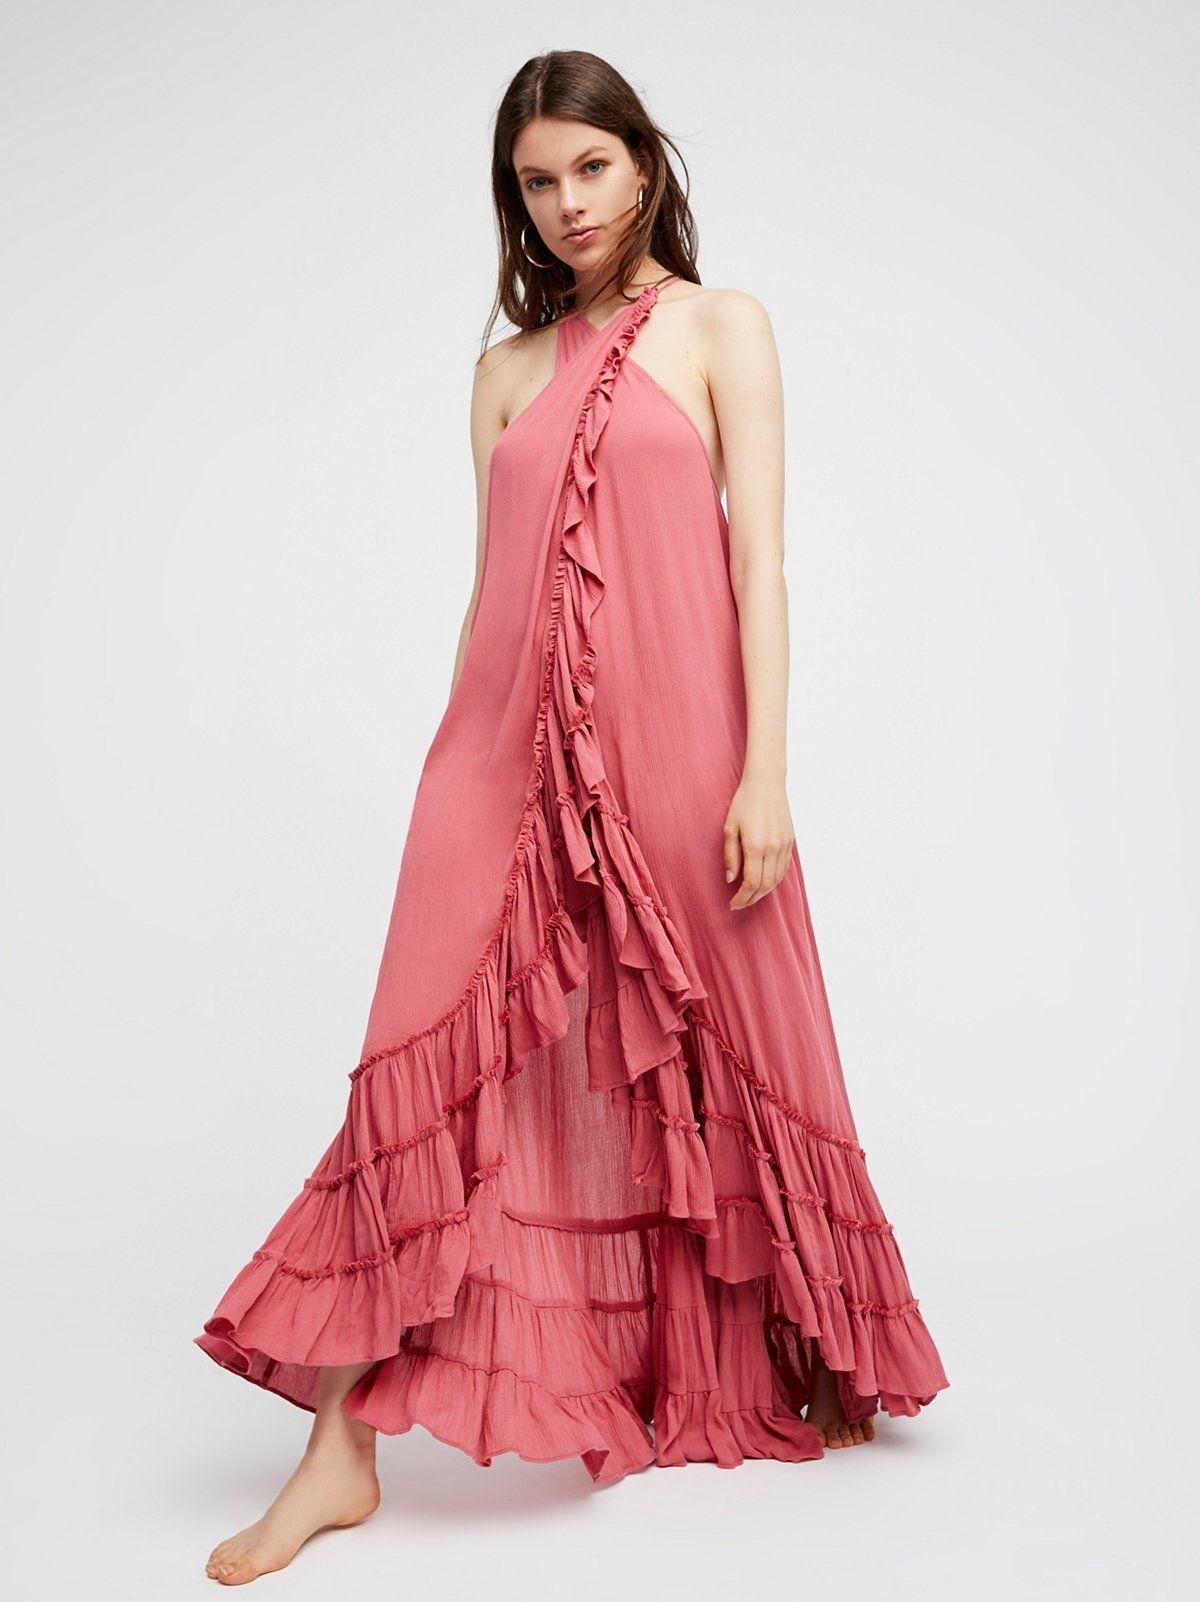 Wrap Around Maxi Dress Maxi Dress Dresses Summer Dresses [ 1602 x 1200 Pixel ]